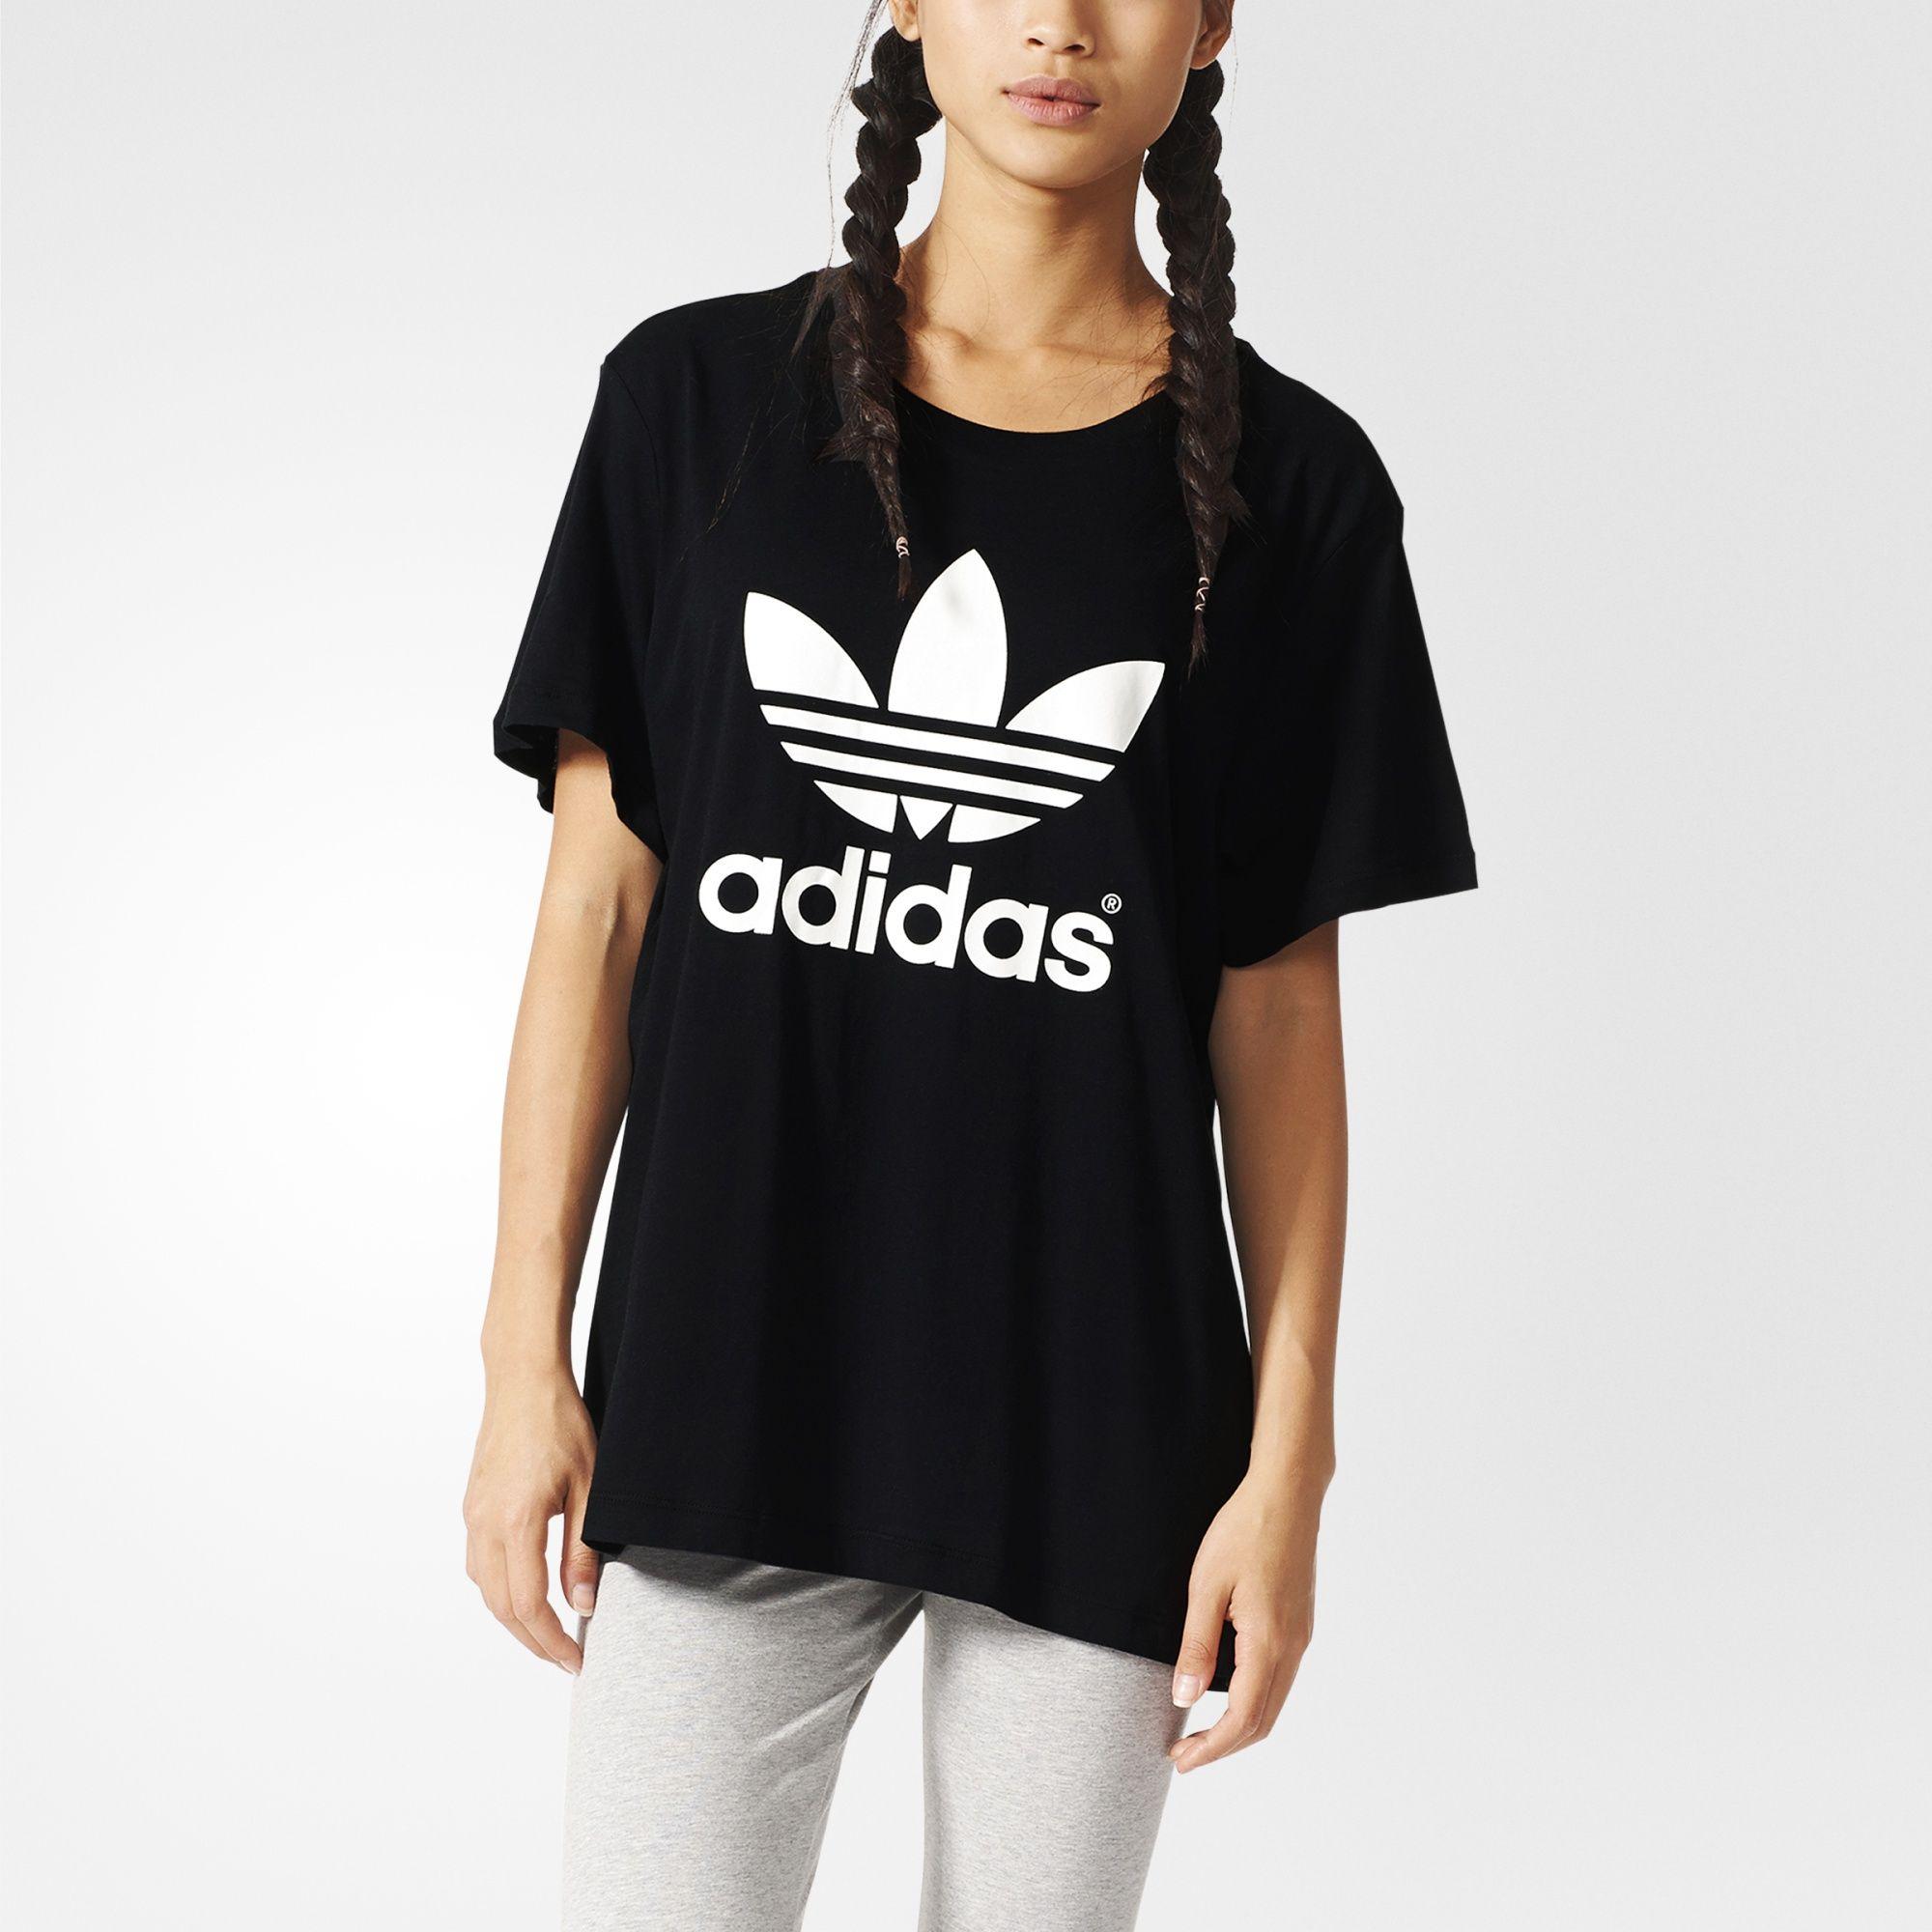 r shirt adidas donna